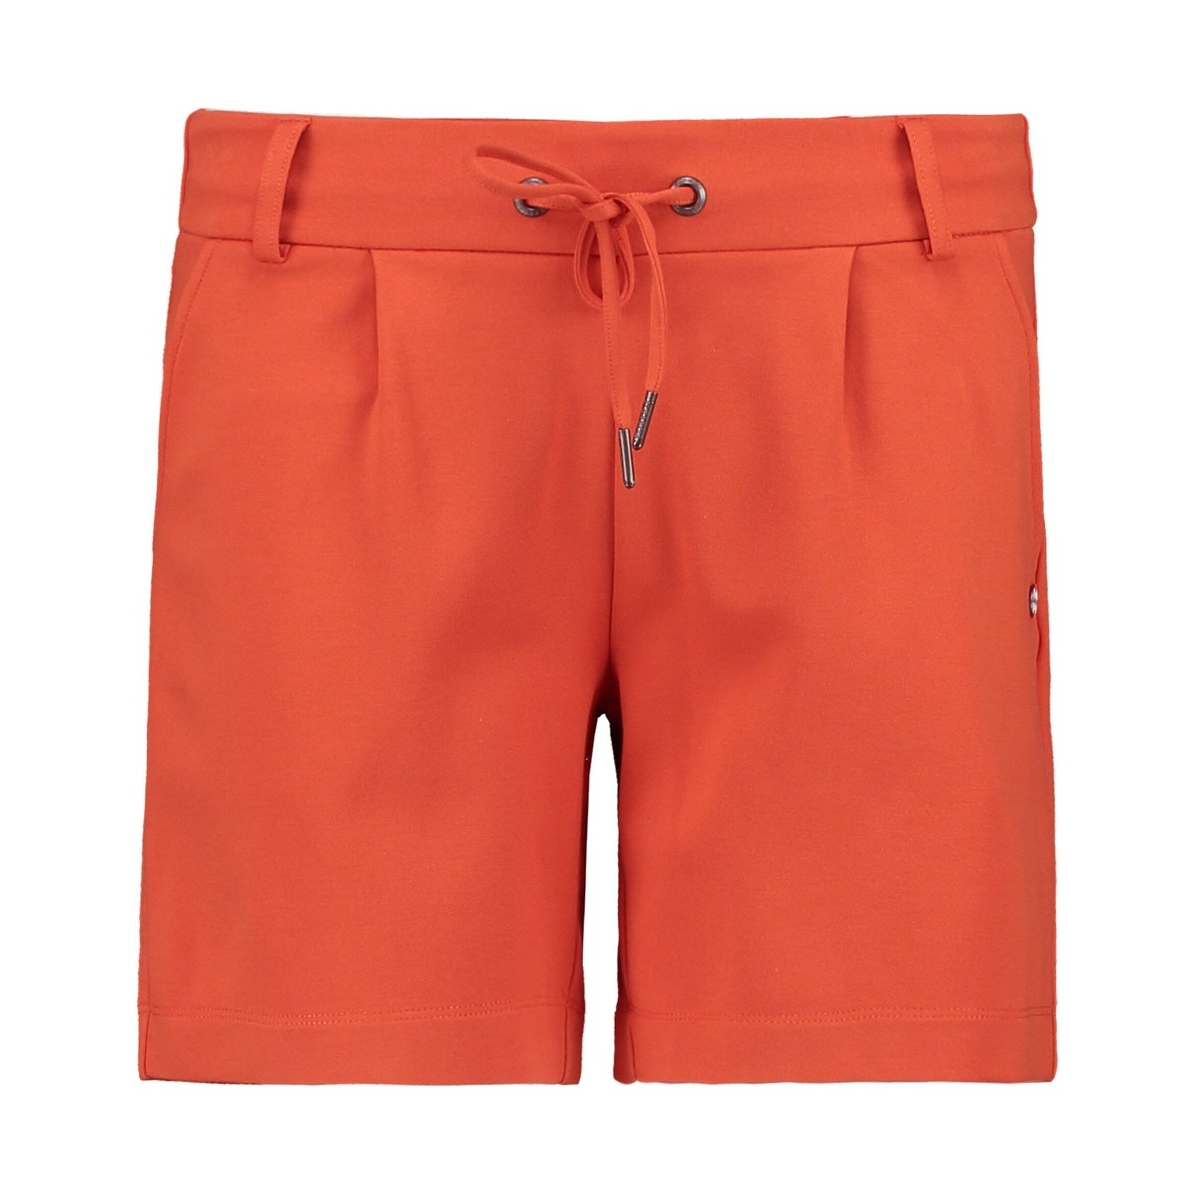 jog short q00141 garcia korte broek 7612 burnt ochre